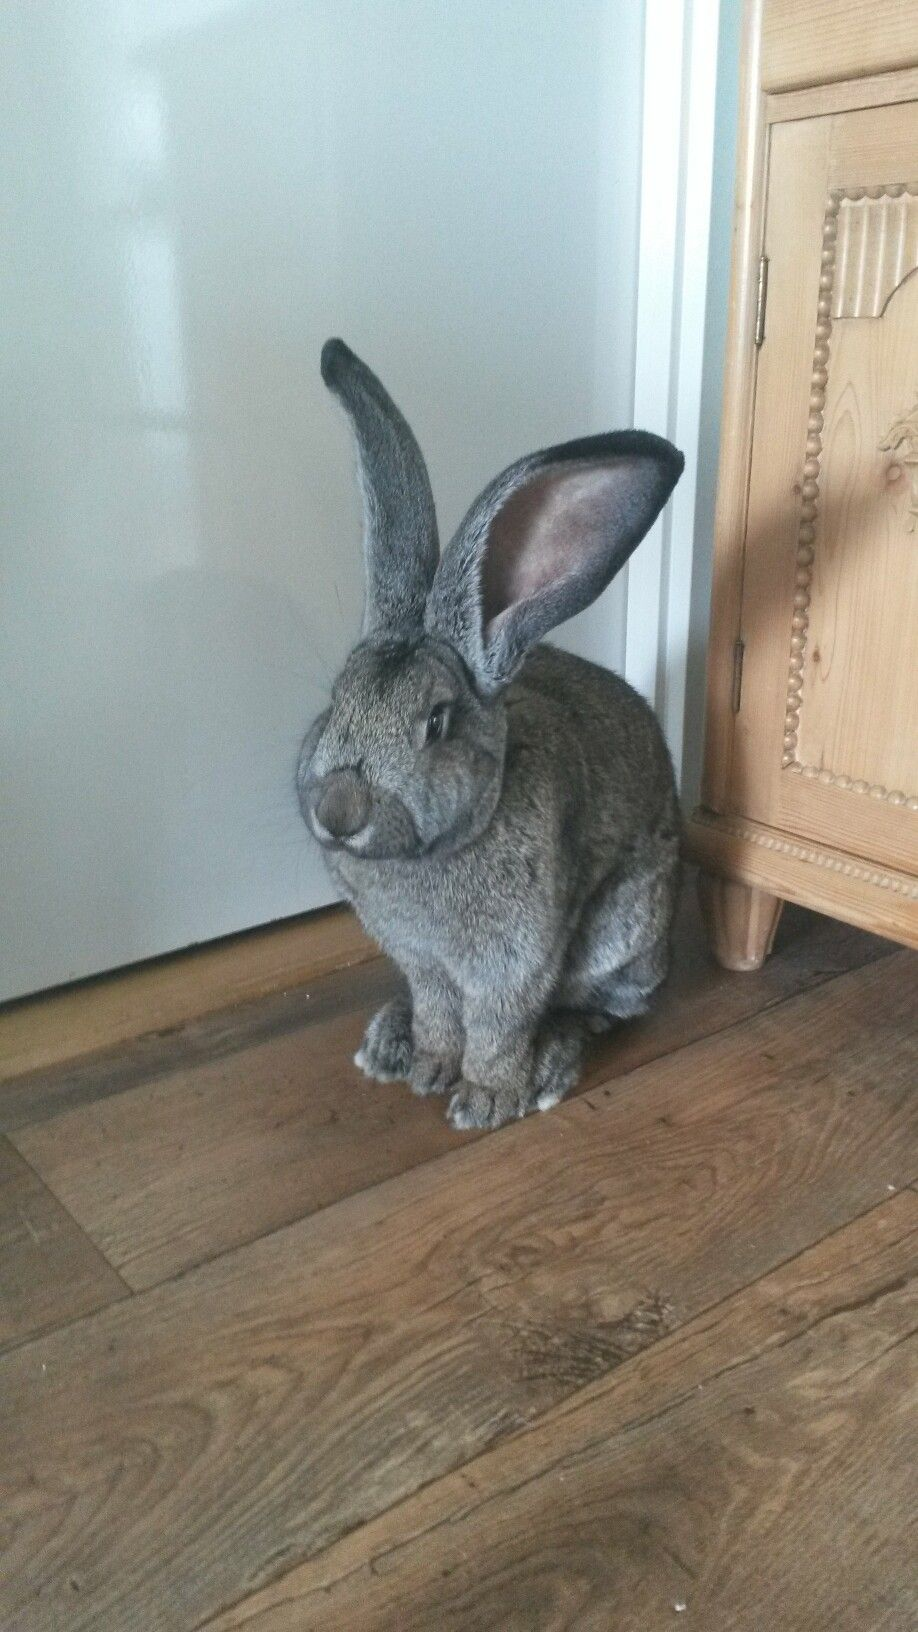 James 8 Months Old Flemish Giant Giant Rabbit Flemish